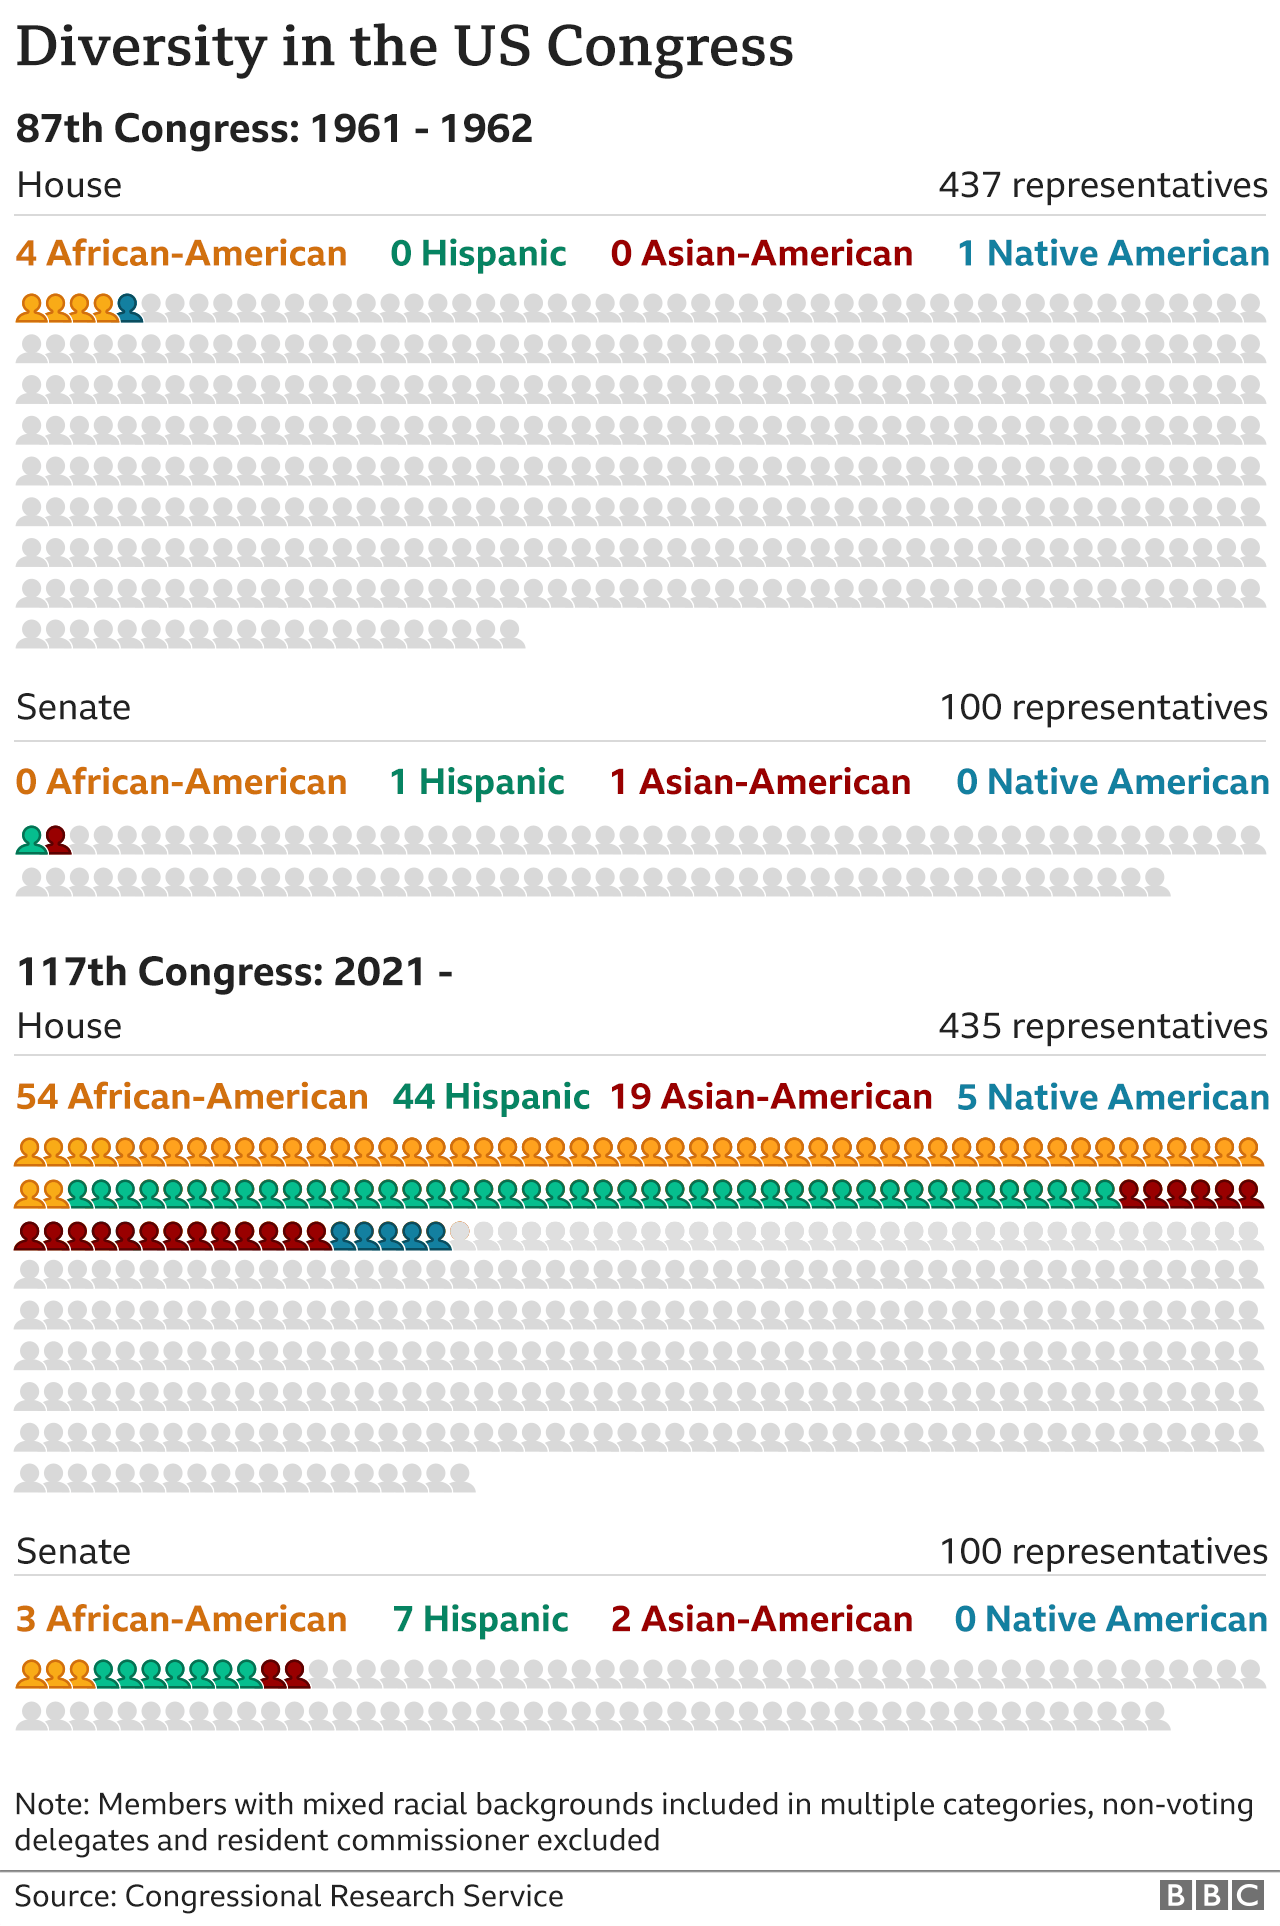 US Congress diversity